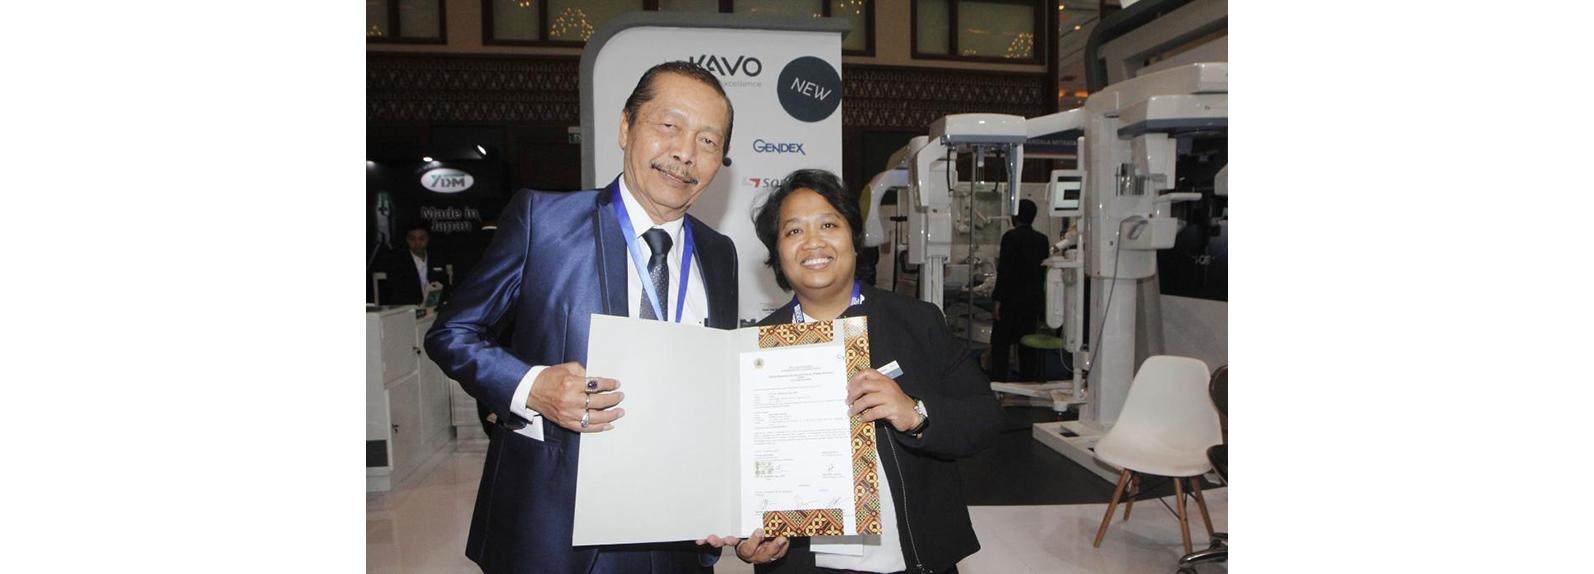 Penandatangan Nota Kesepahaman Fakultas Kedokteran Gigi Universitas Prof Dr Moestopo dengan PT Gratia Jaya Mulya